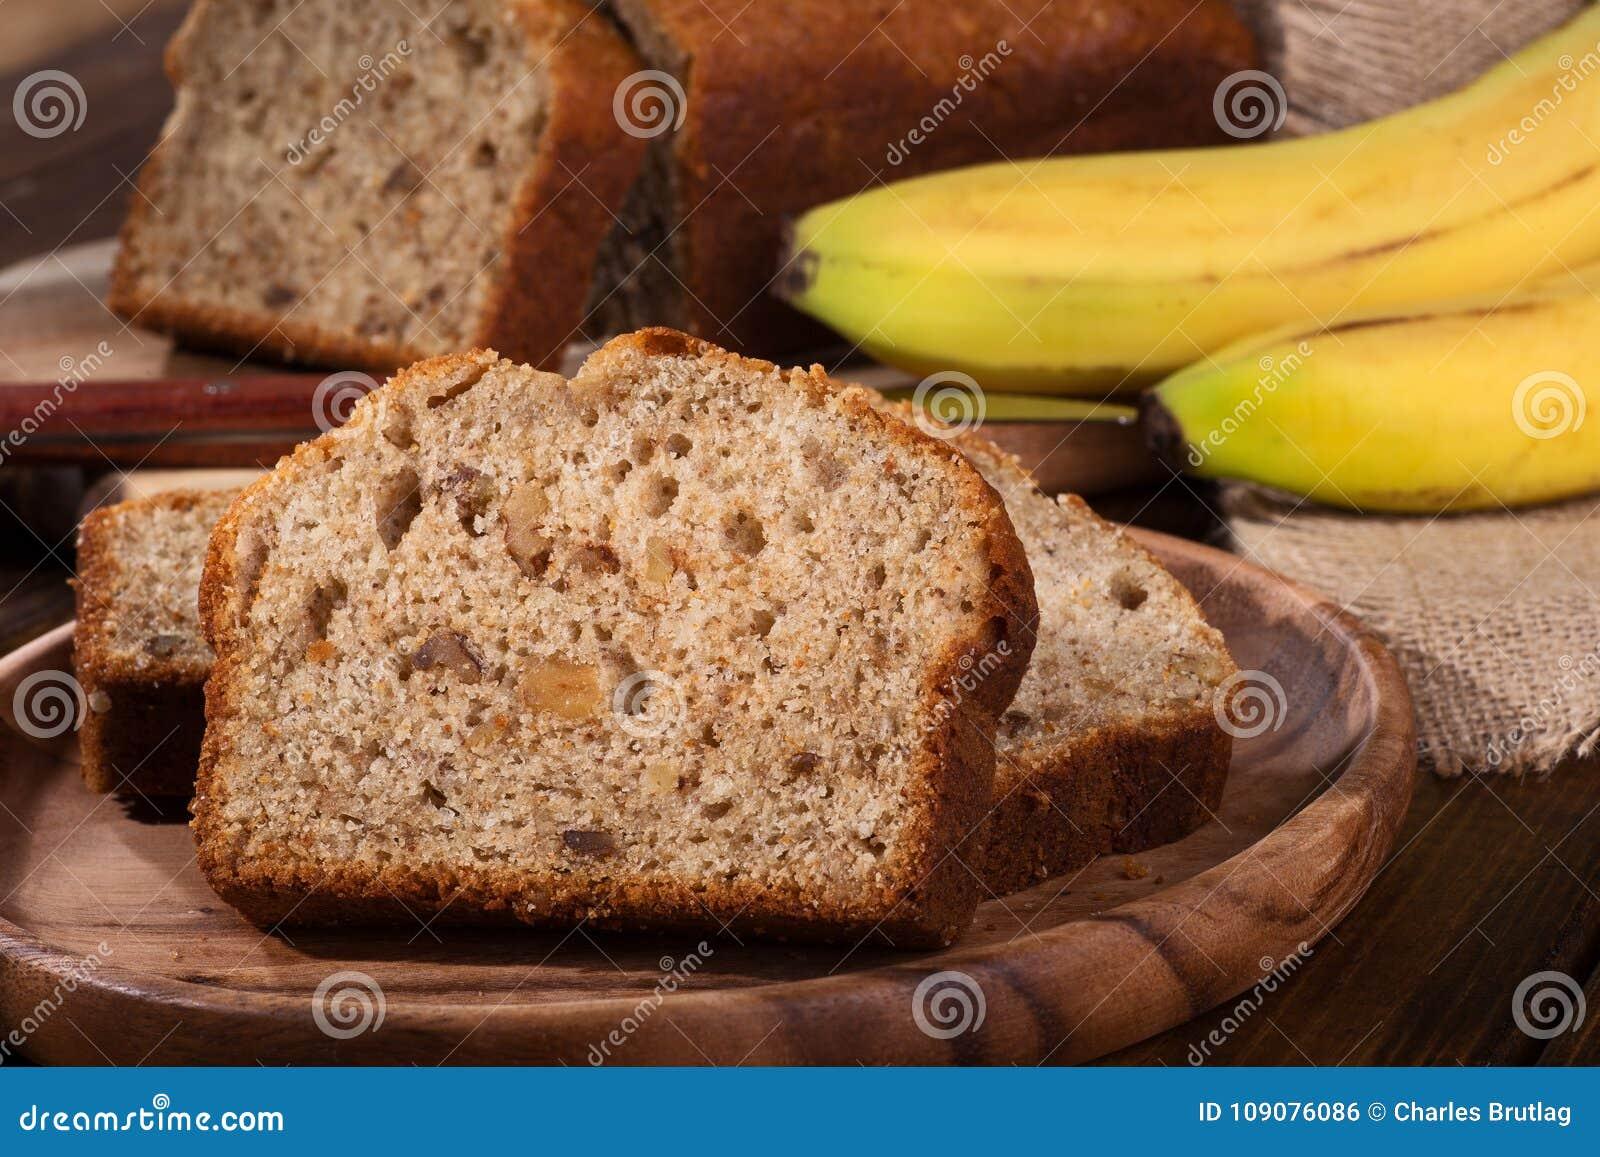 Bananen Nuss Bonbon Brot Stockfoto Bild Von Imbiss Kuchen 109076086